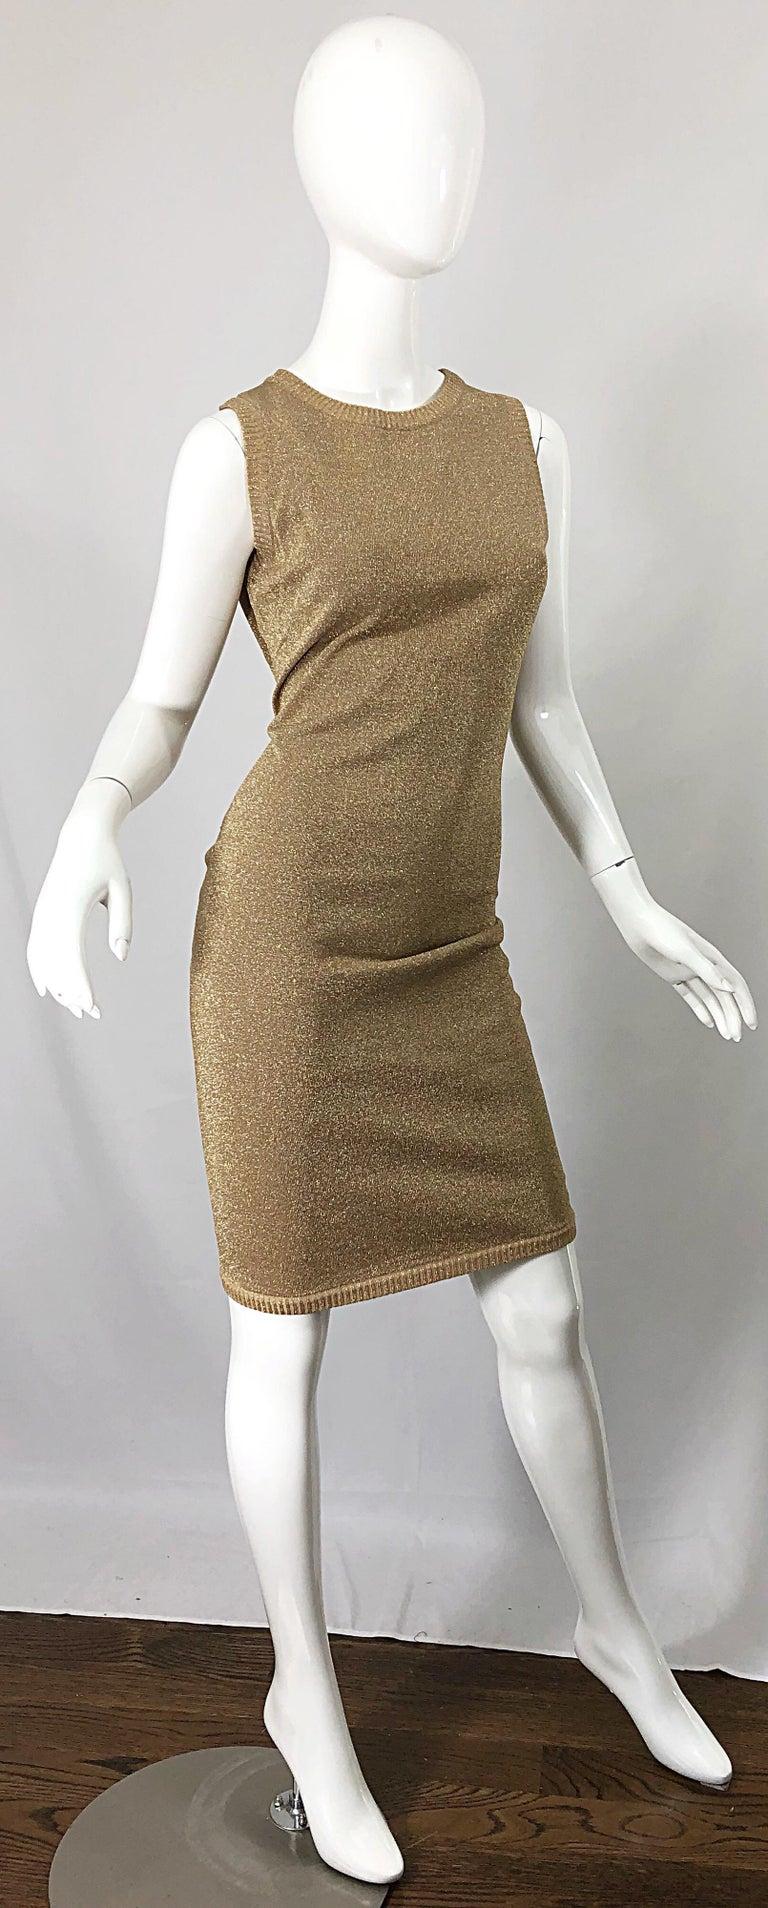 Mila Schoon 1990s Gold Metallic Cut - Out Back Vintage 90s Bodycon Dress For Sale 2